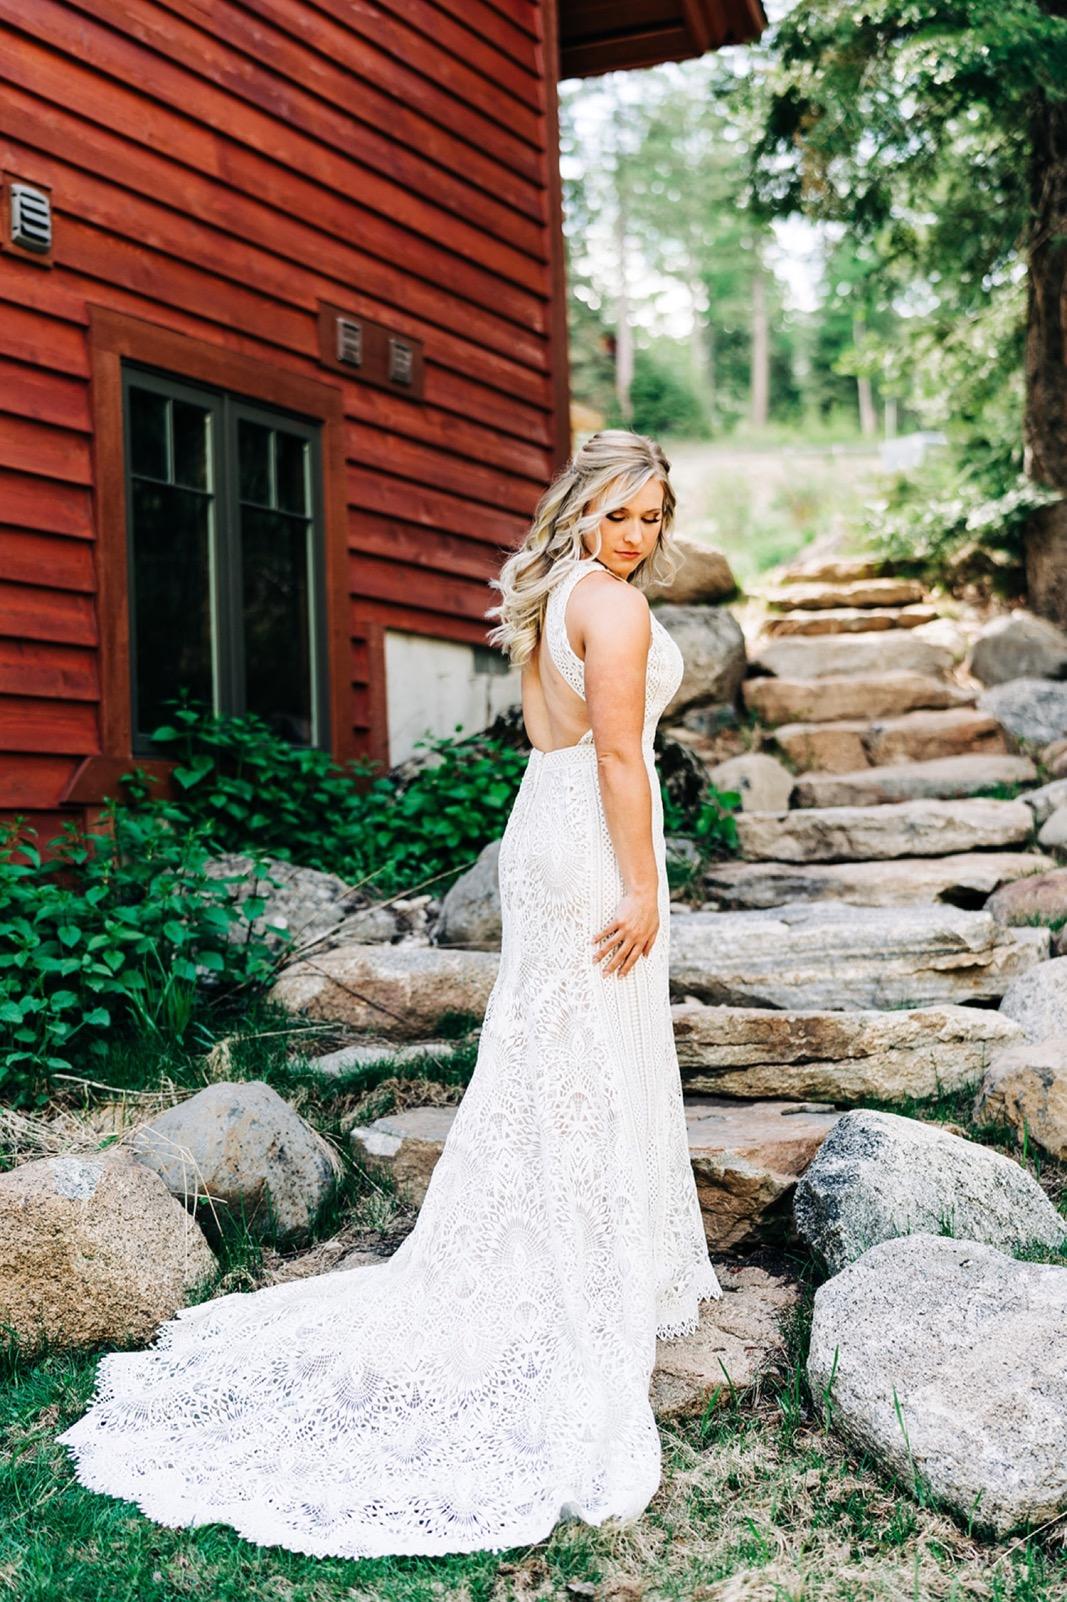 021_falissa_heather_wedding-50.jpg